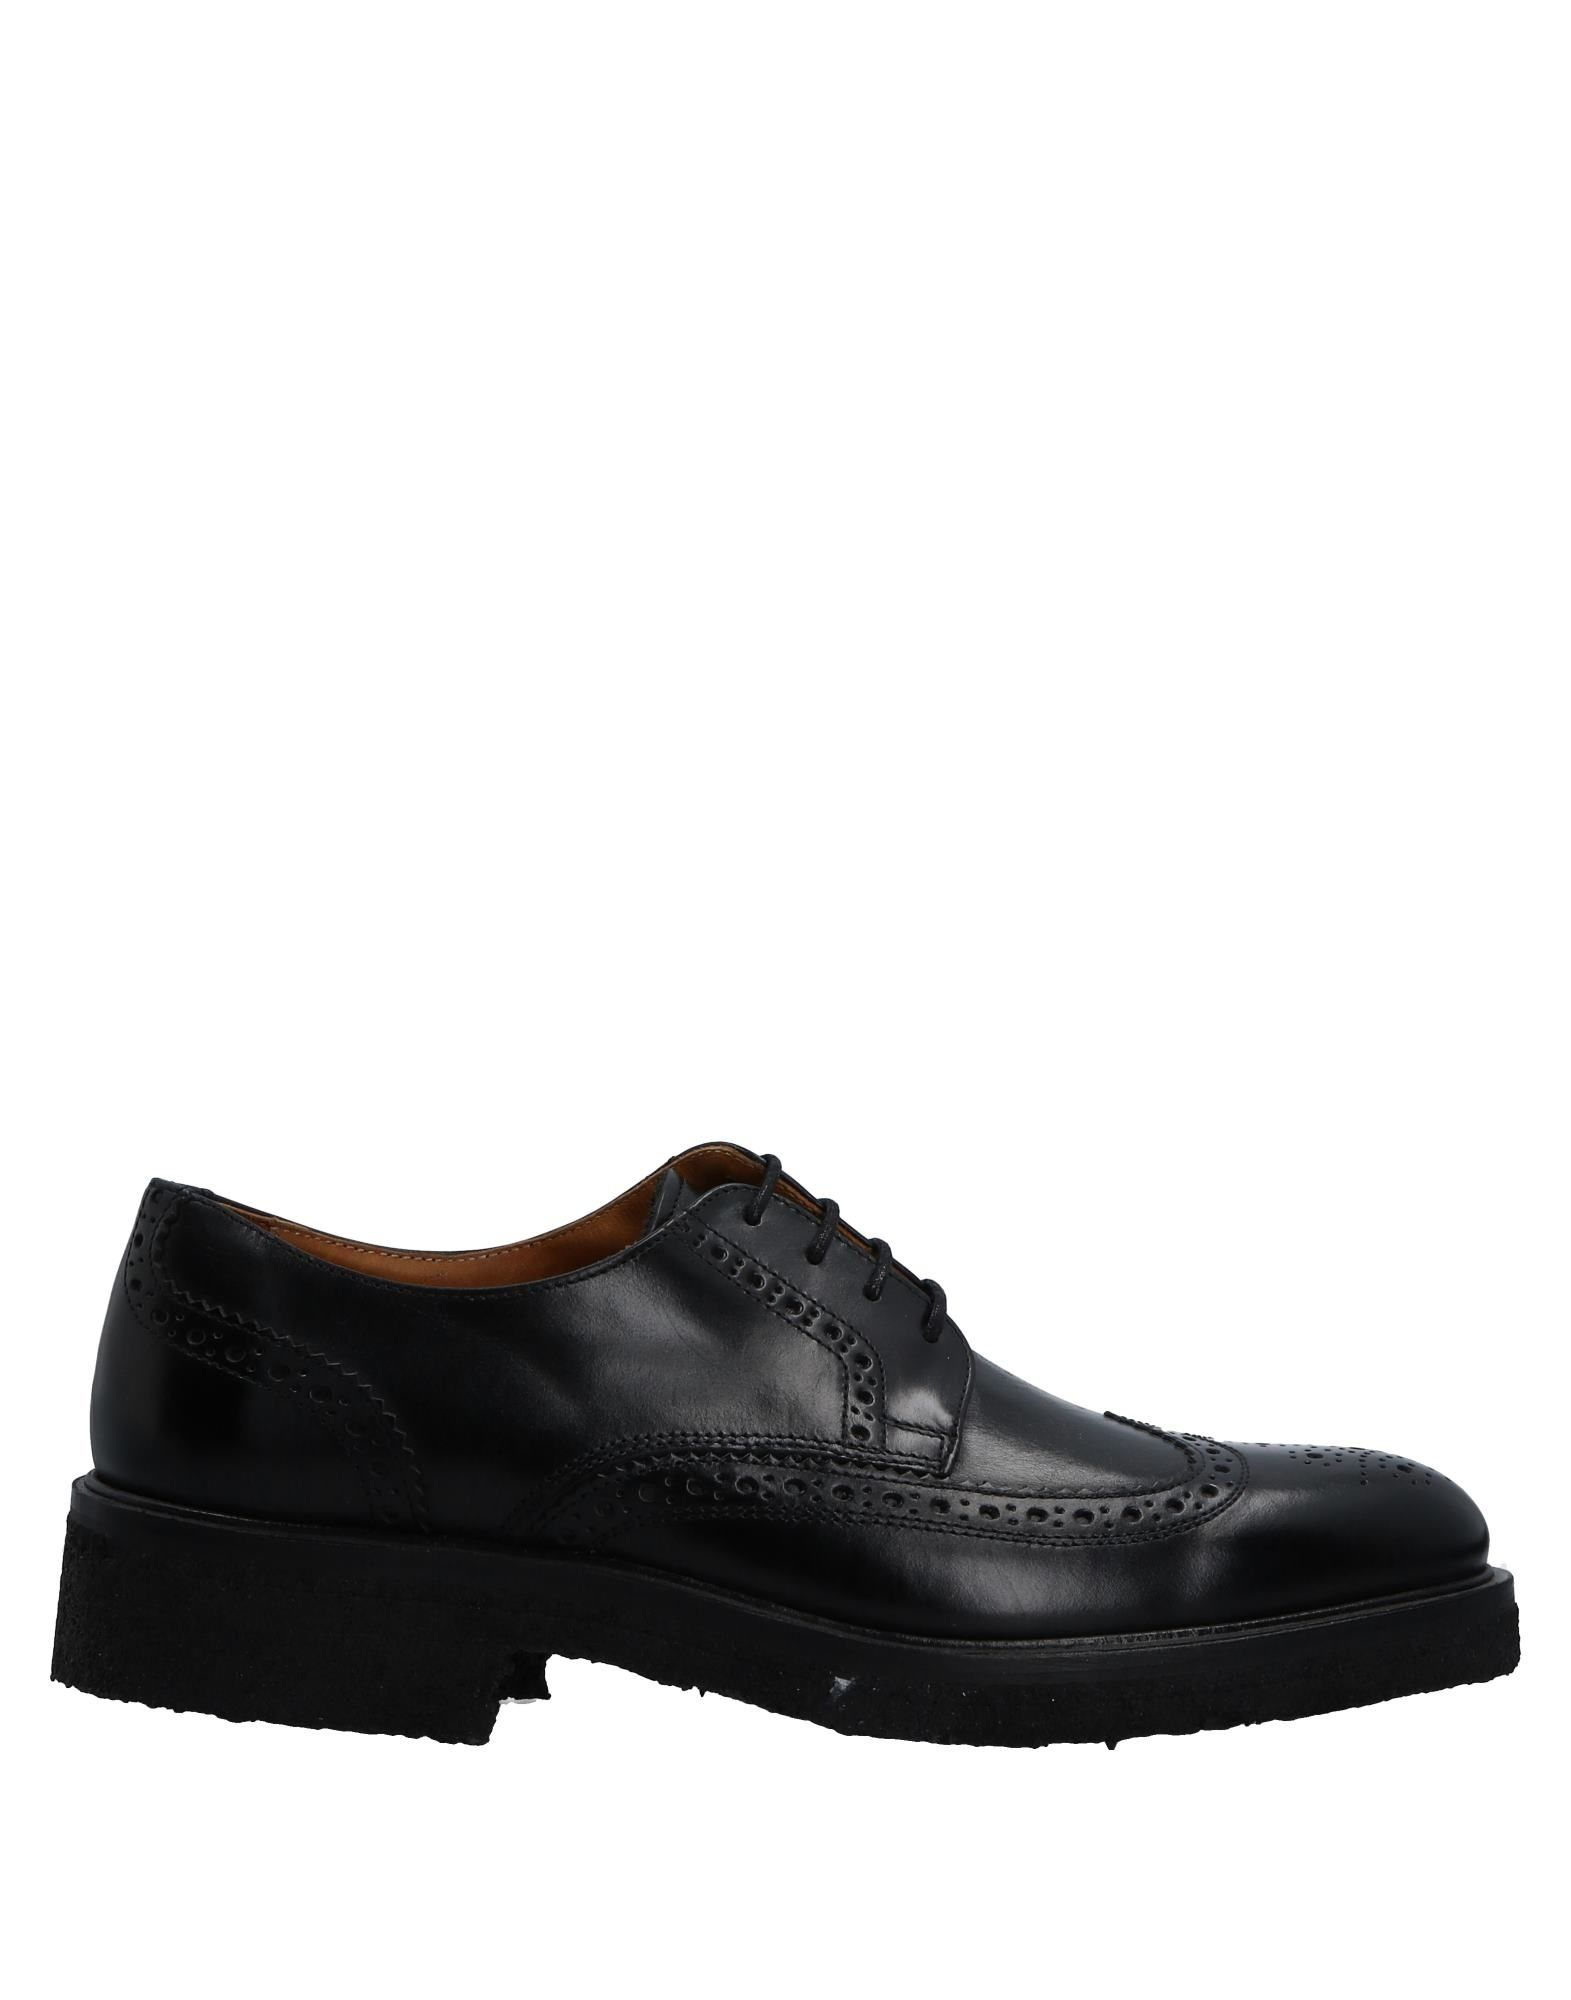 Rabatt echte Schuhe Selected Homme Schnürschuhe Herren  11529394VB